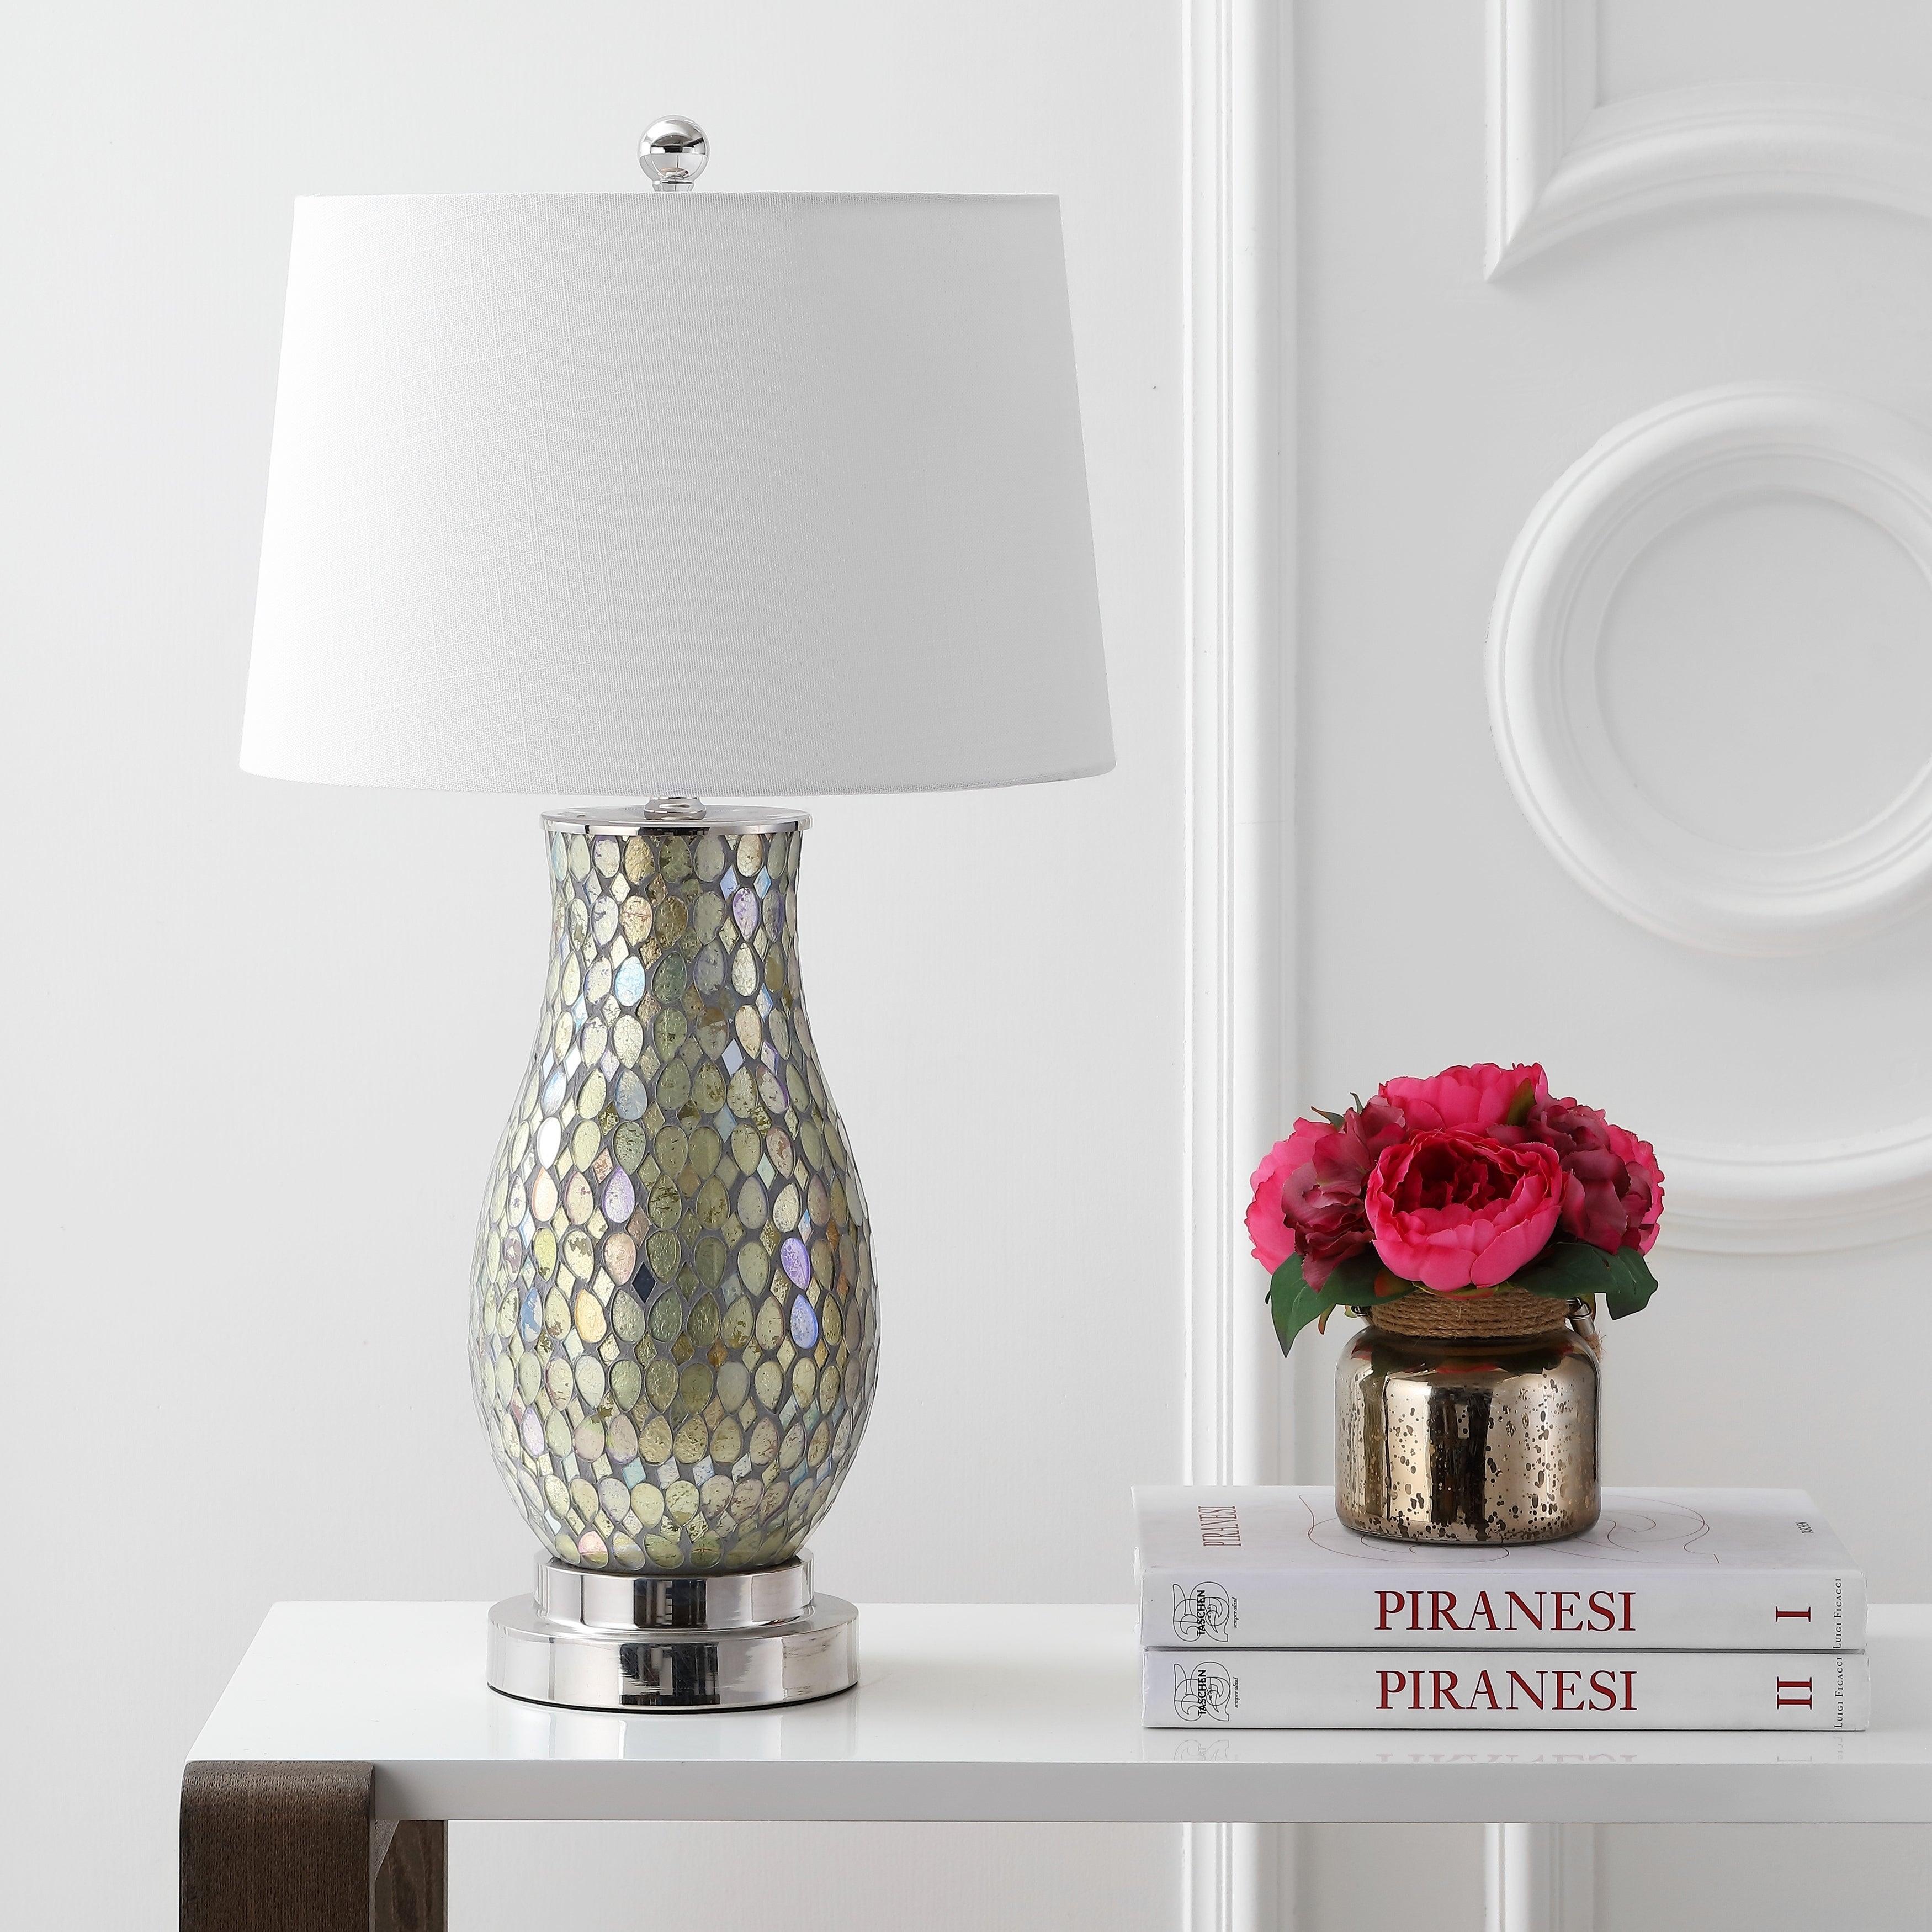 Amazing Douglas 28 Mosaic Led Table Lamp Green By Jonathan Y Interior Design Ideas Clesiryabchikinfo